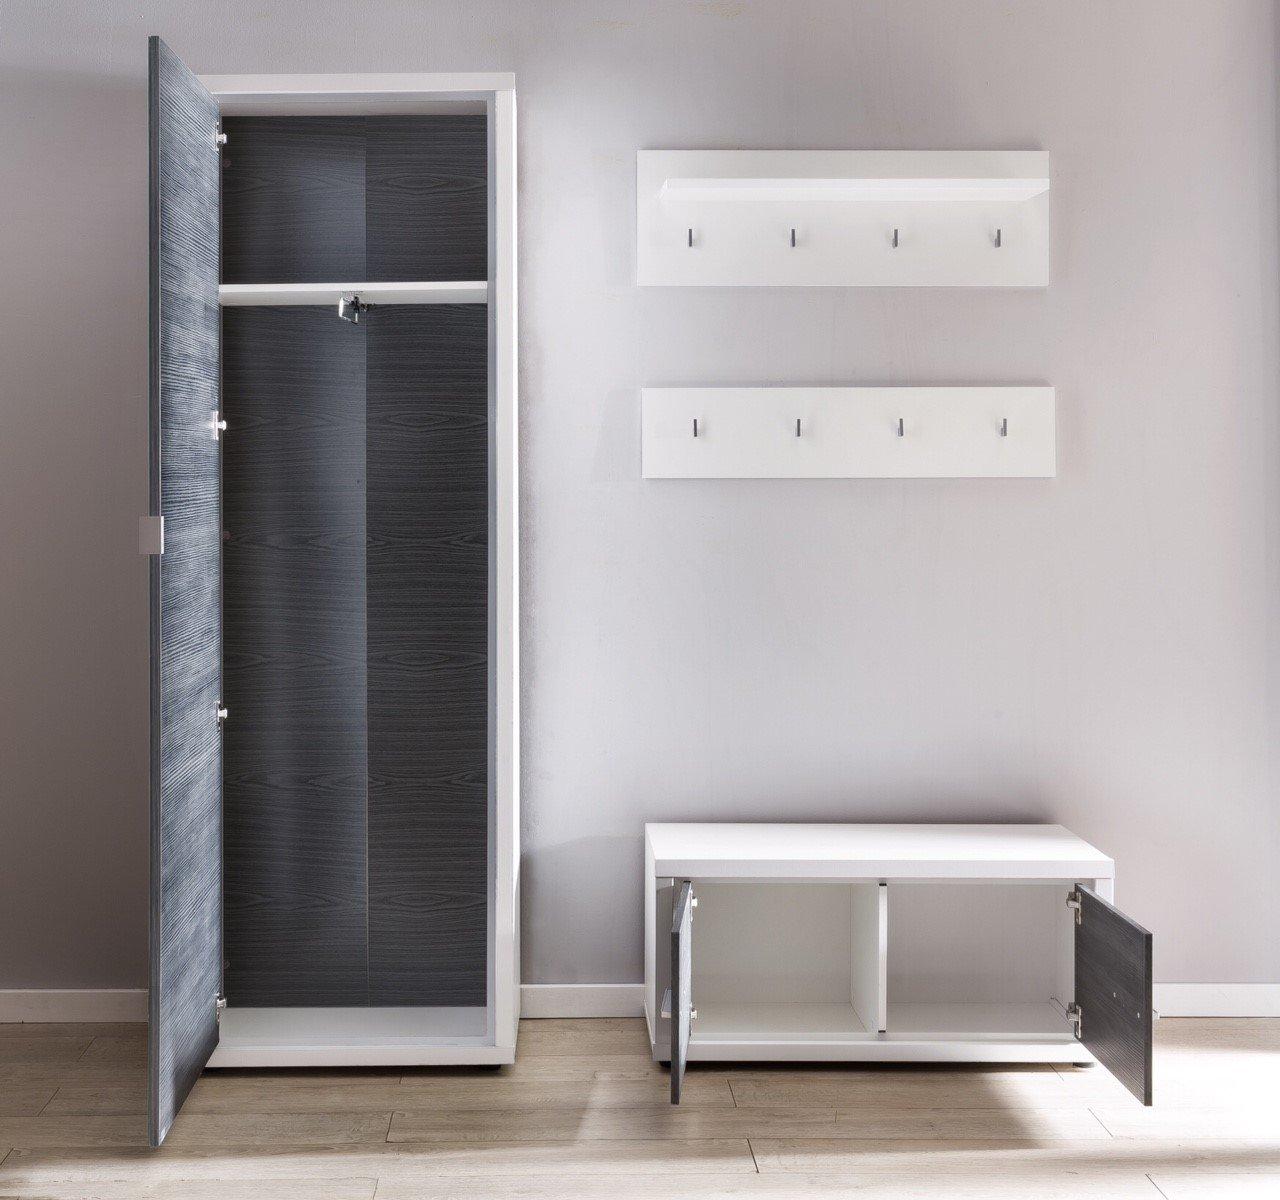 forestdream garderobe light inkl beleuchtung m bel letz ihr online shop. Black Bedroom Furniture Sets. Home Design Ideas